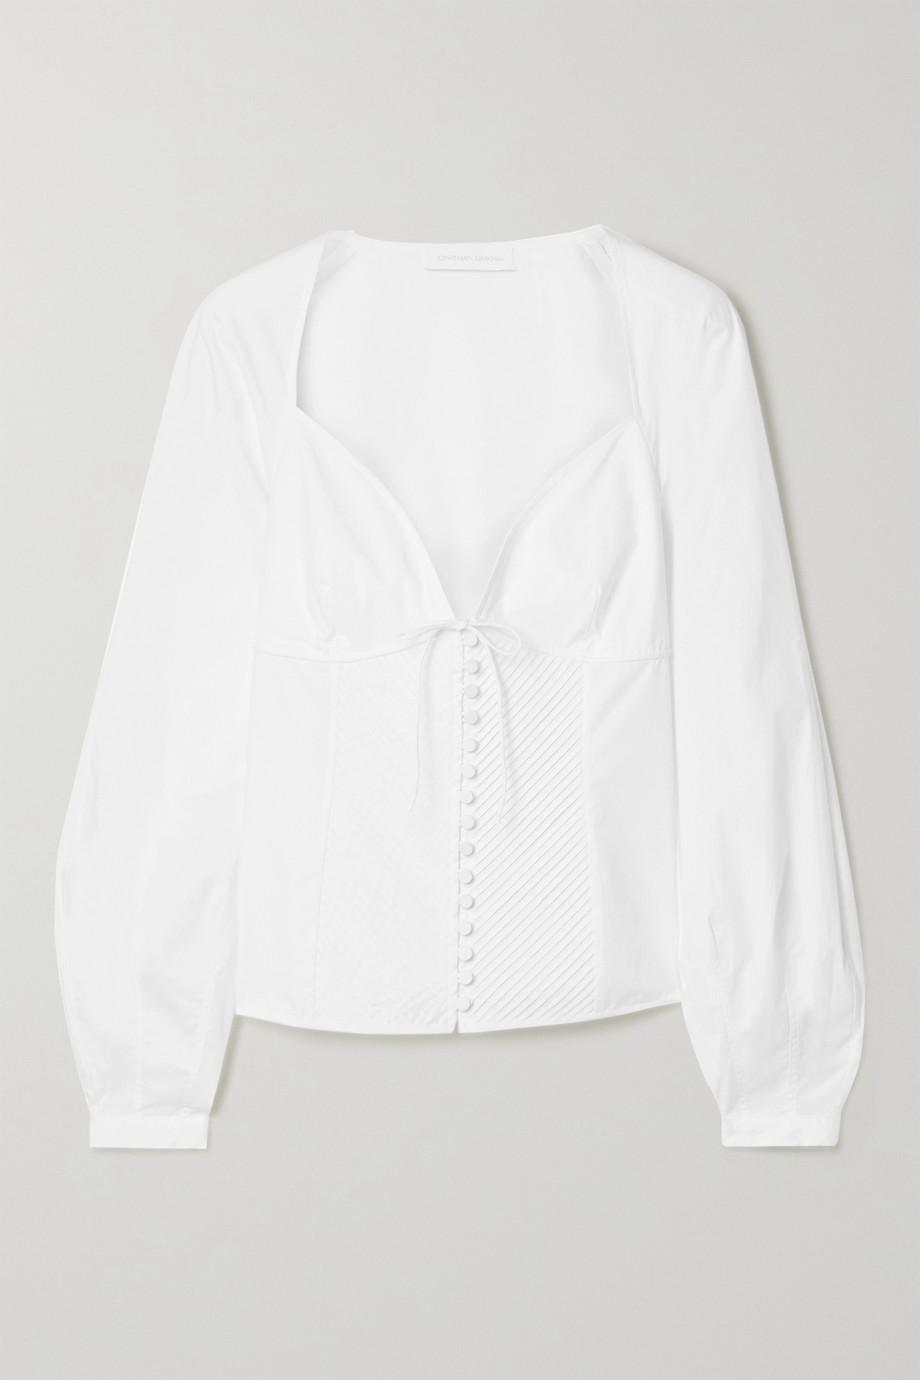 Jonathan Simkhai June pintucked cotton-blend poplin blouse